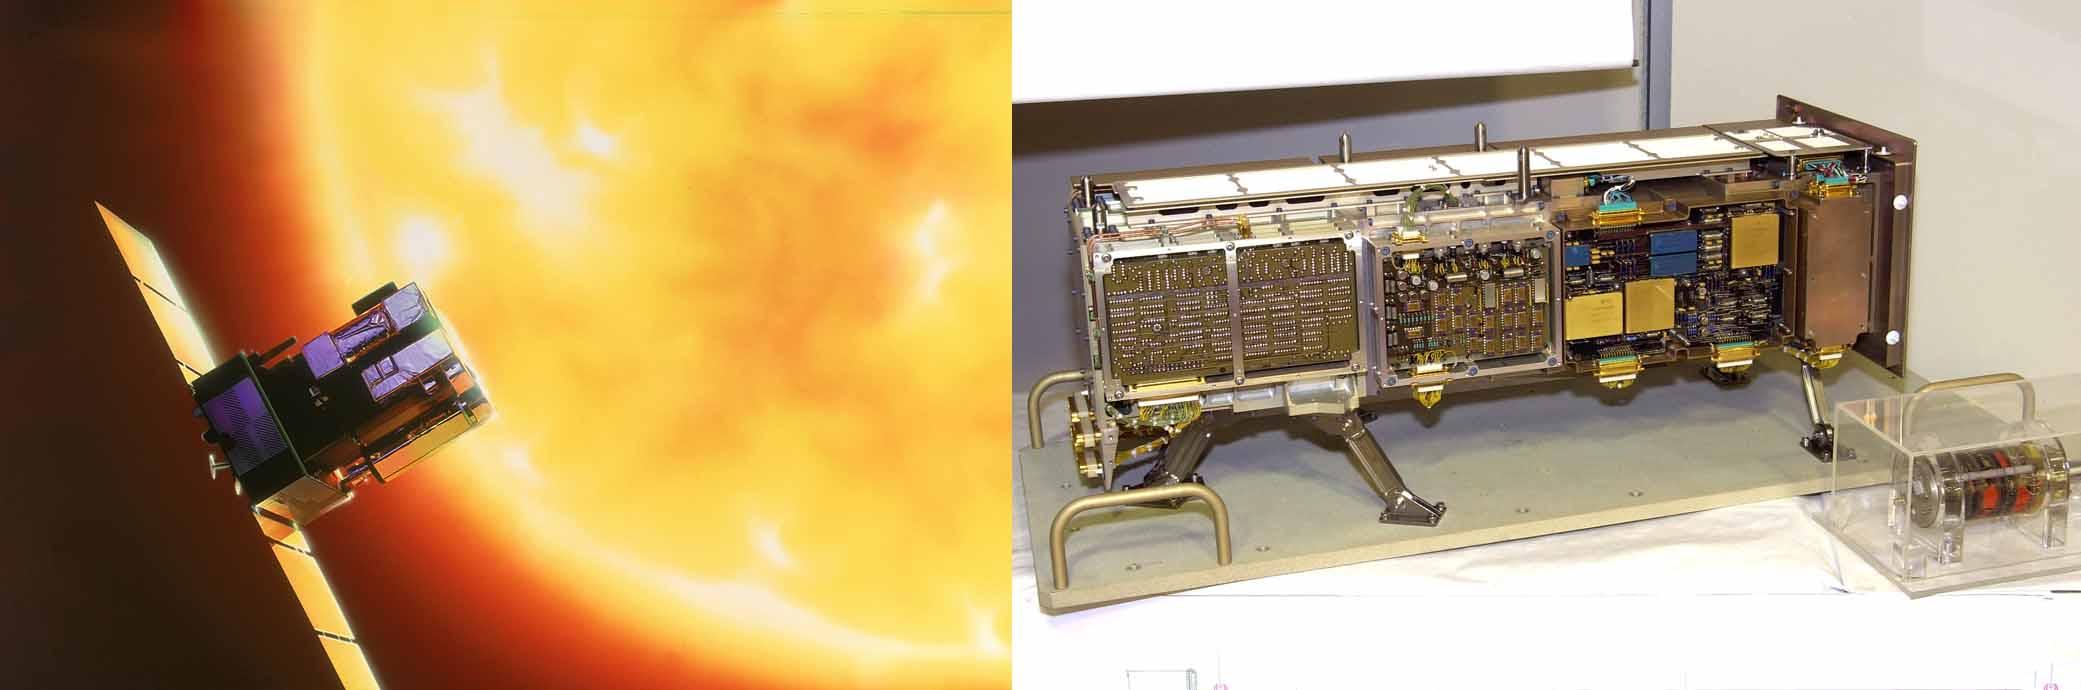 Le satellite SOHO